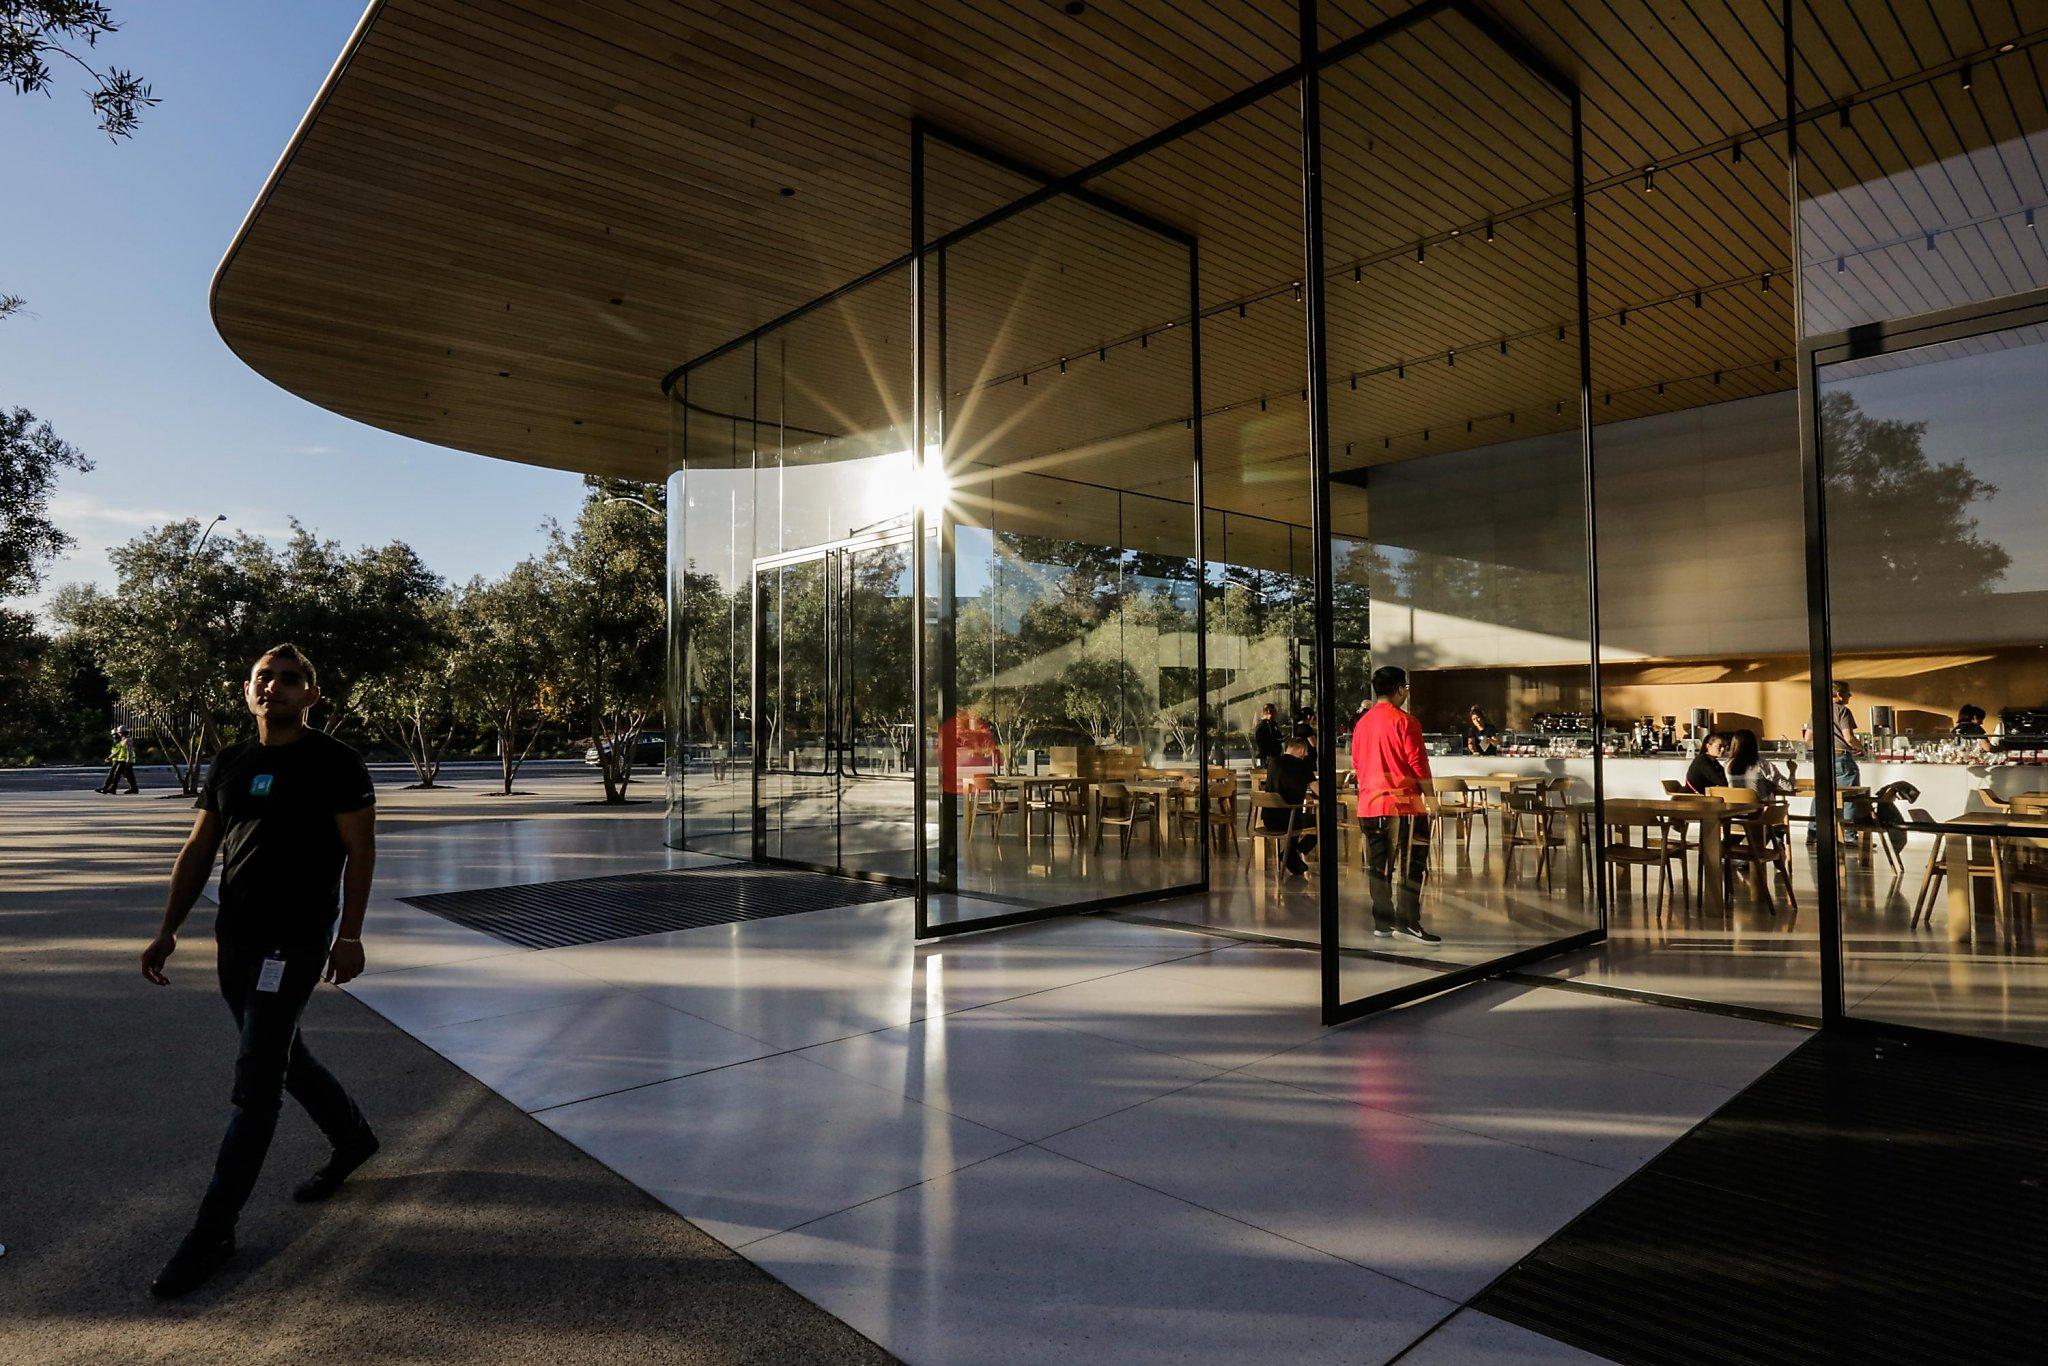 Apple's polished visitor center has a strange detachment - SFChronicle.com